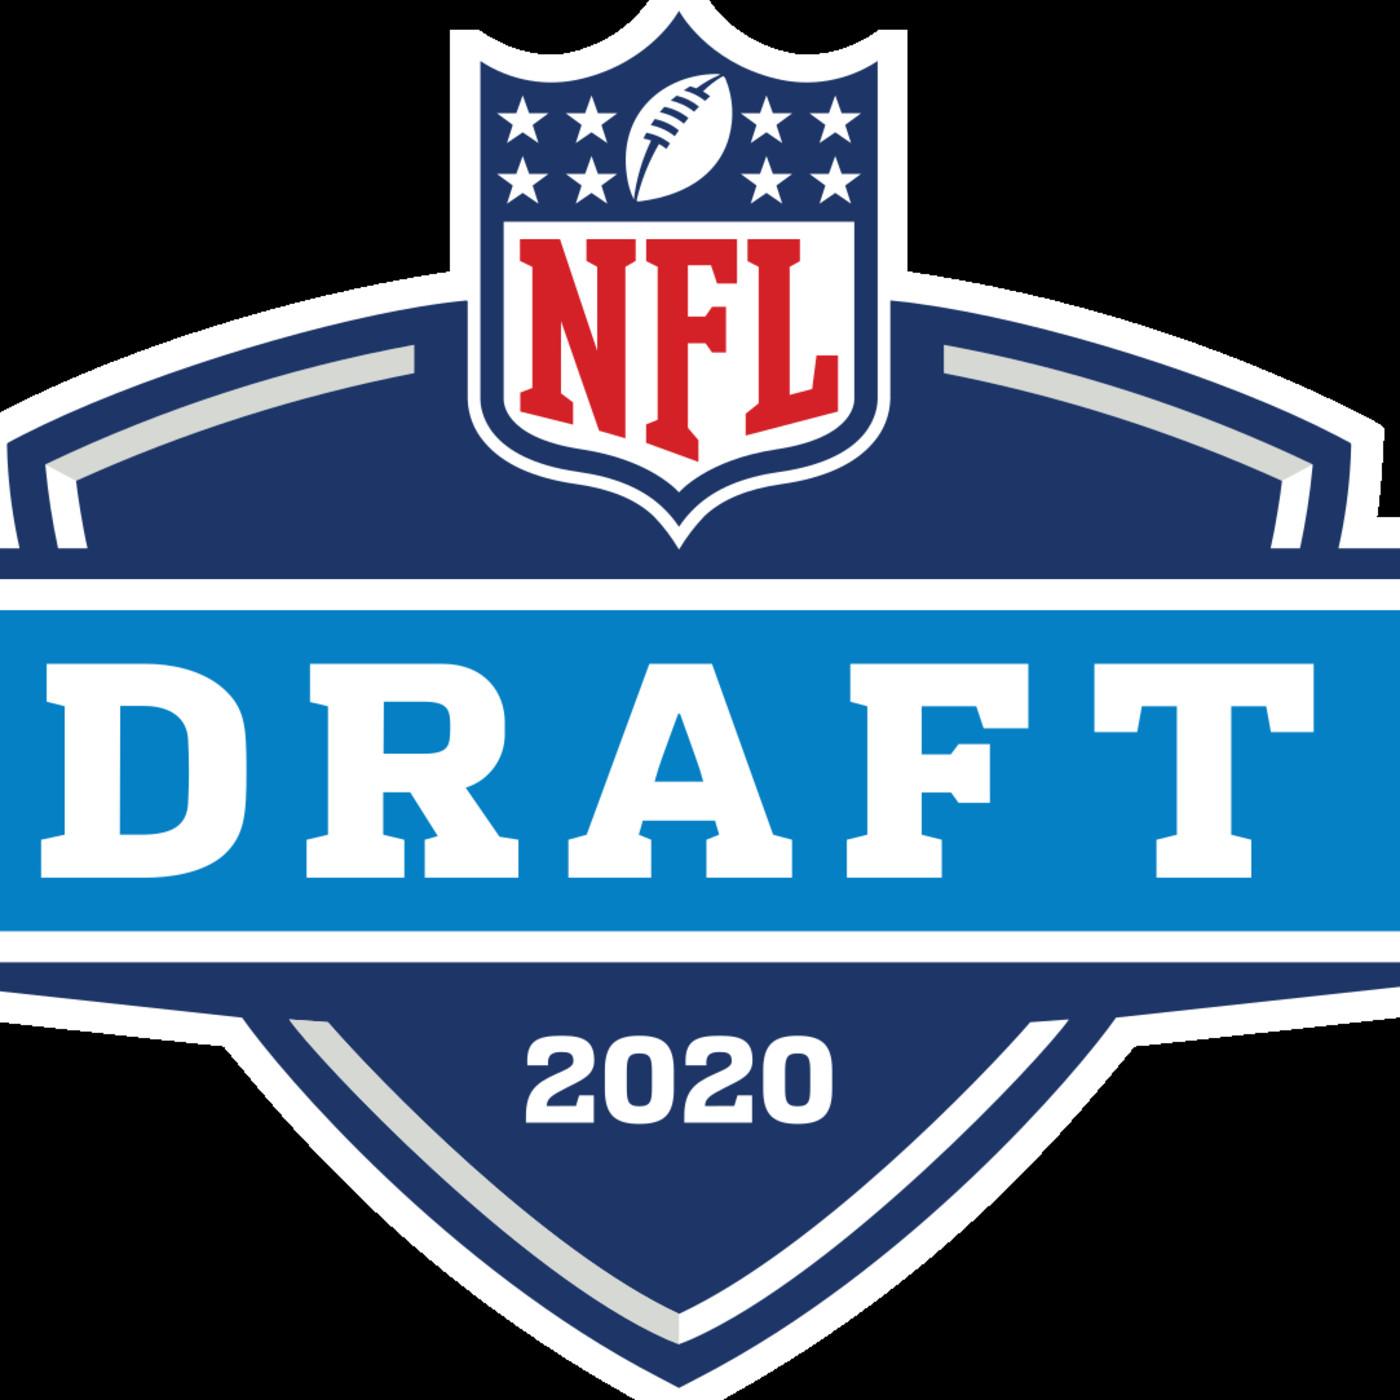 Draft NFL 2020, parte II, T10/E3